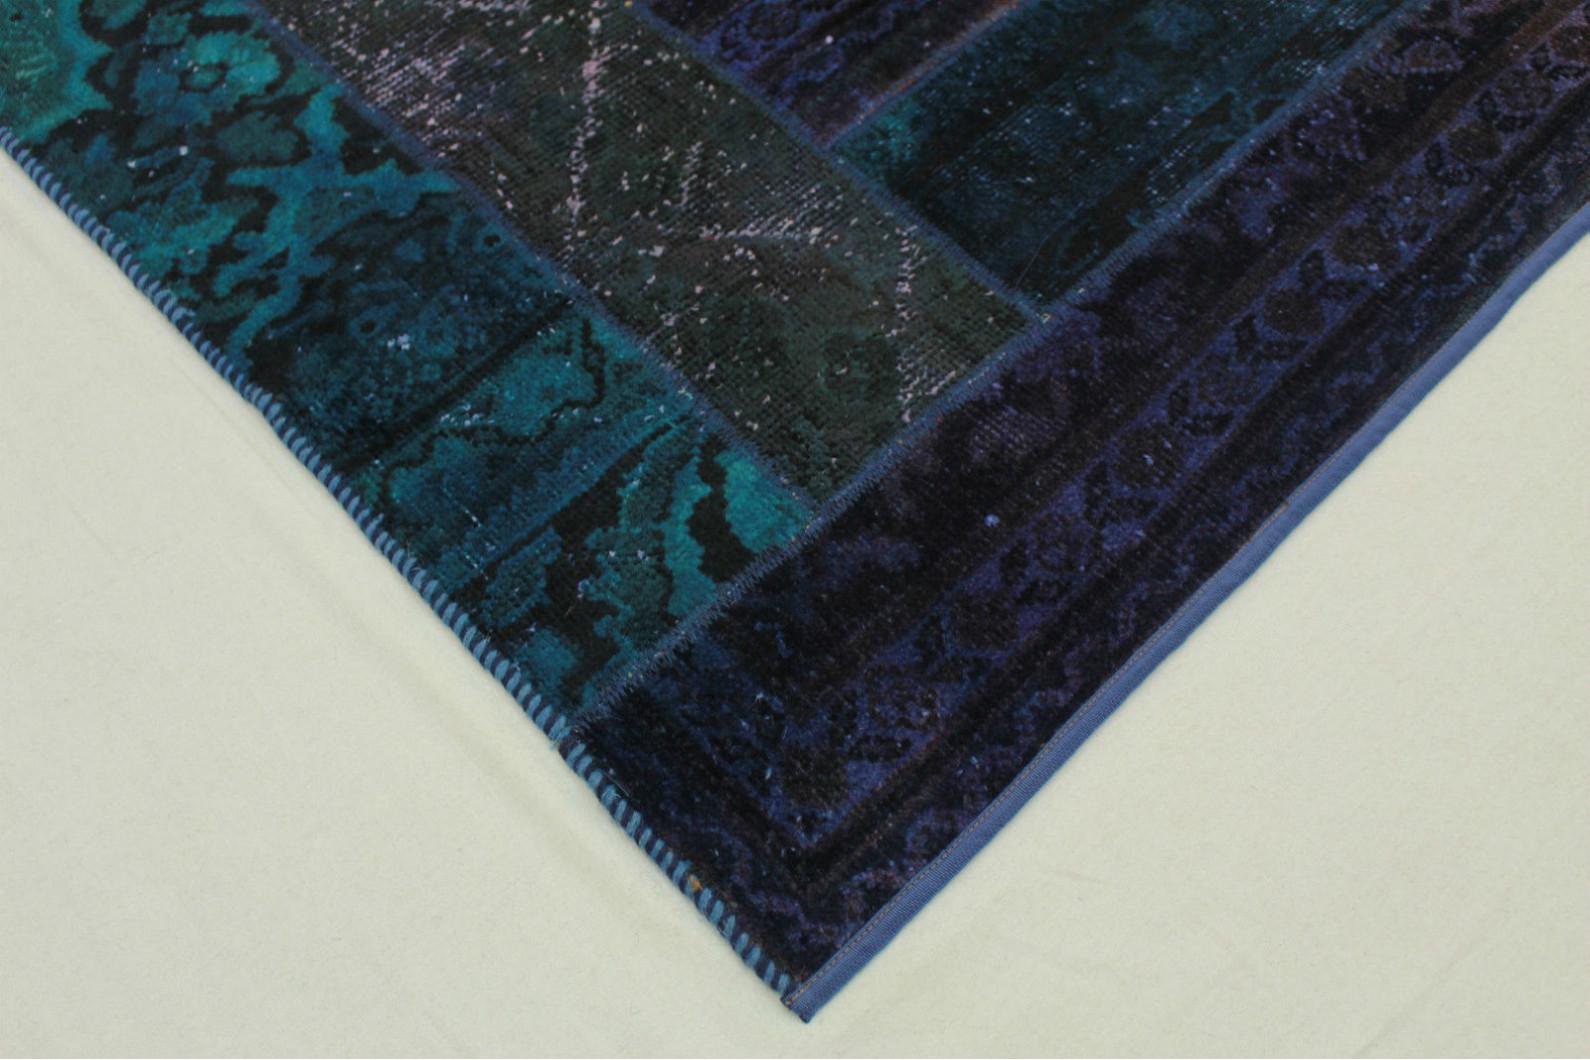 patchwork teppich lila blau in 200x150cm 1001 1373 bei. Black Bedroom Furniture Sets. Home Design Ideas